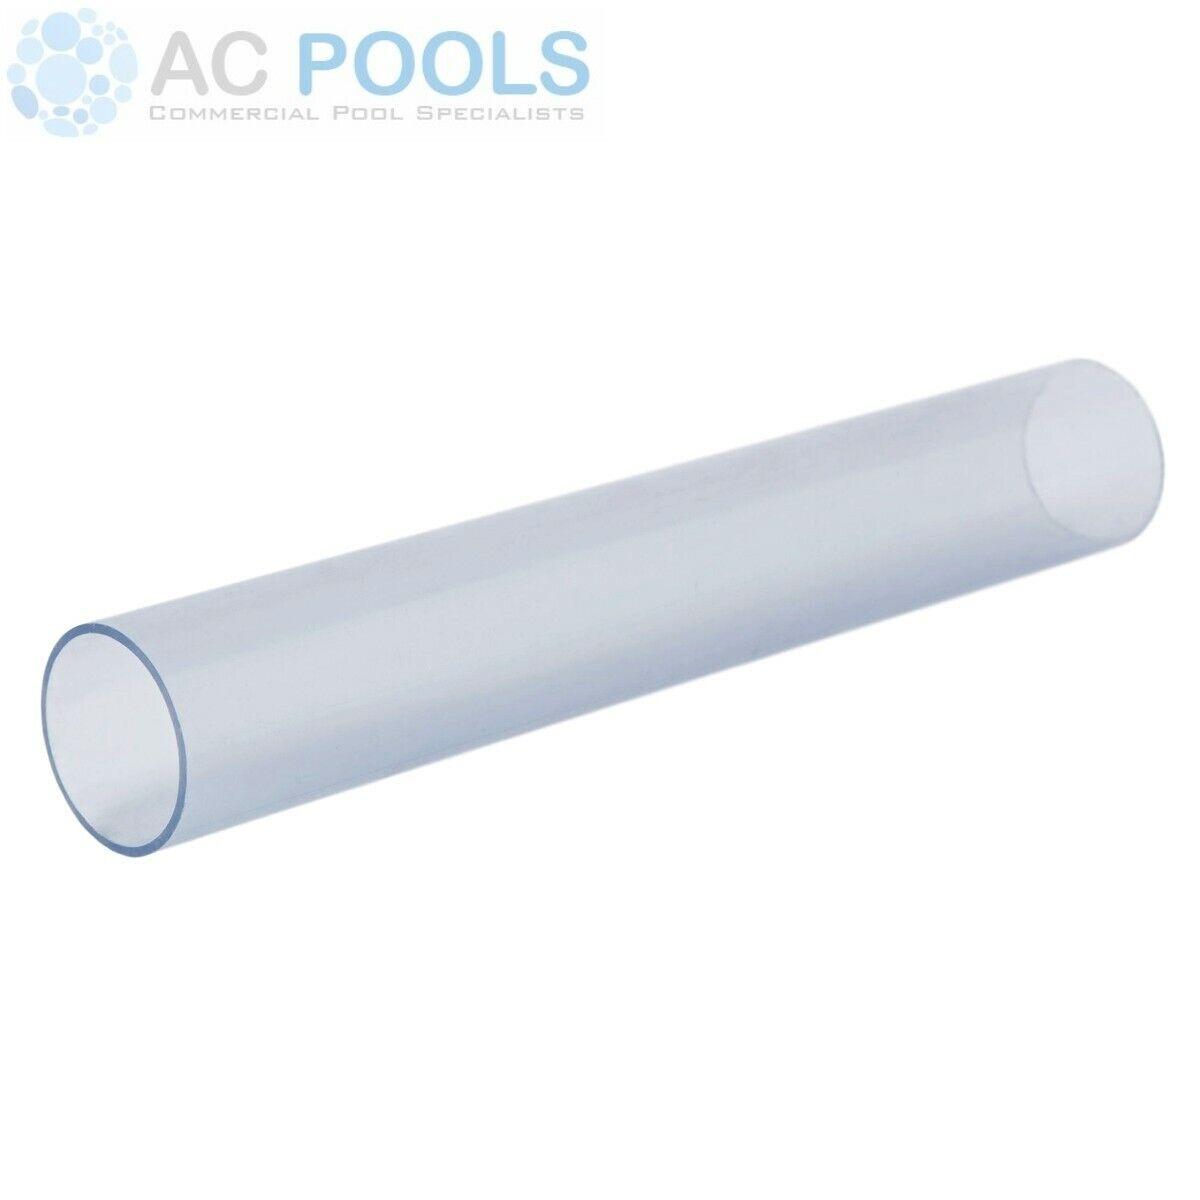 Clear PVC Pressure Pipe 100mm (1000mm Length) Rigid